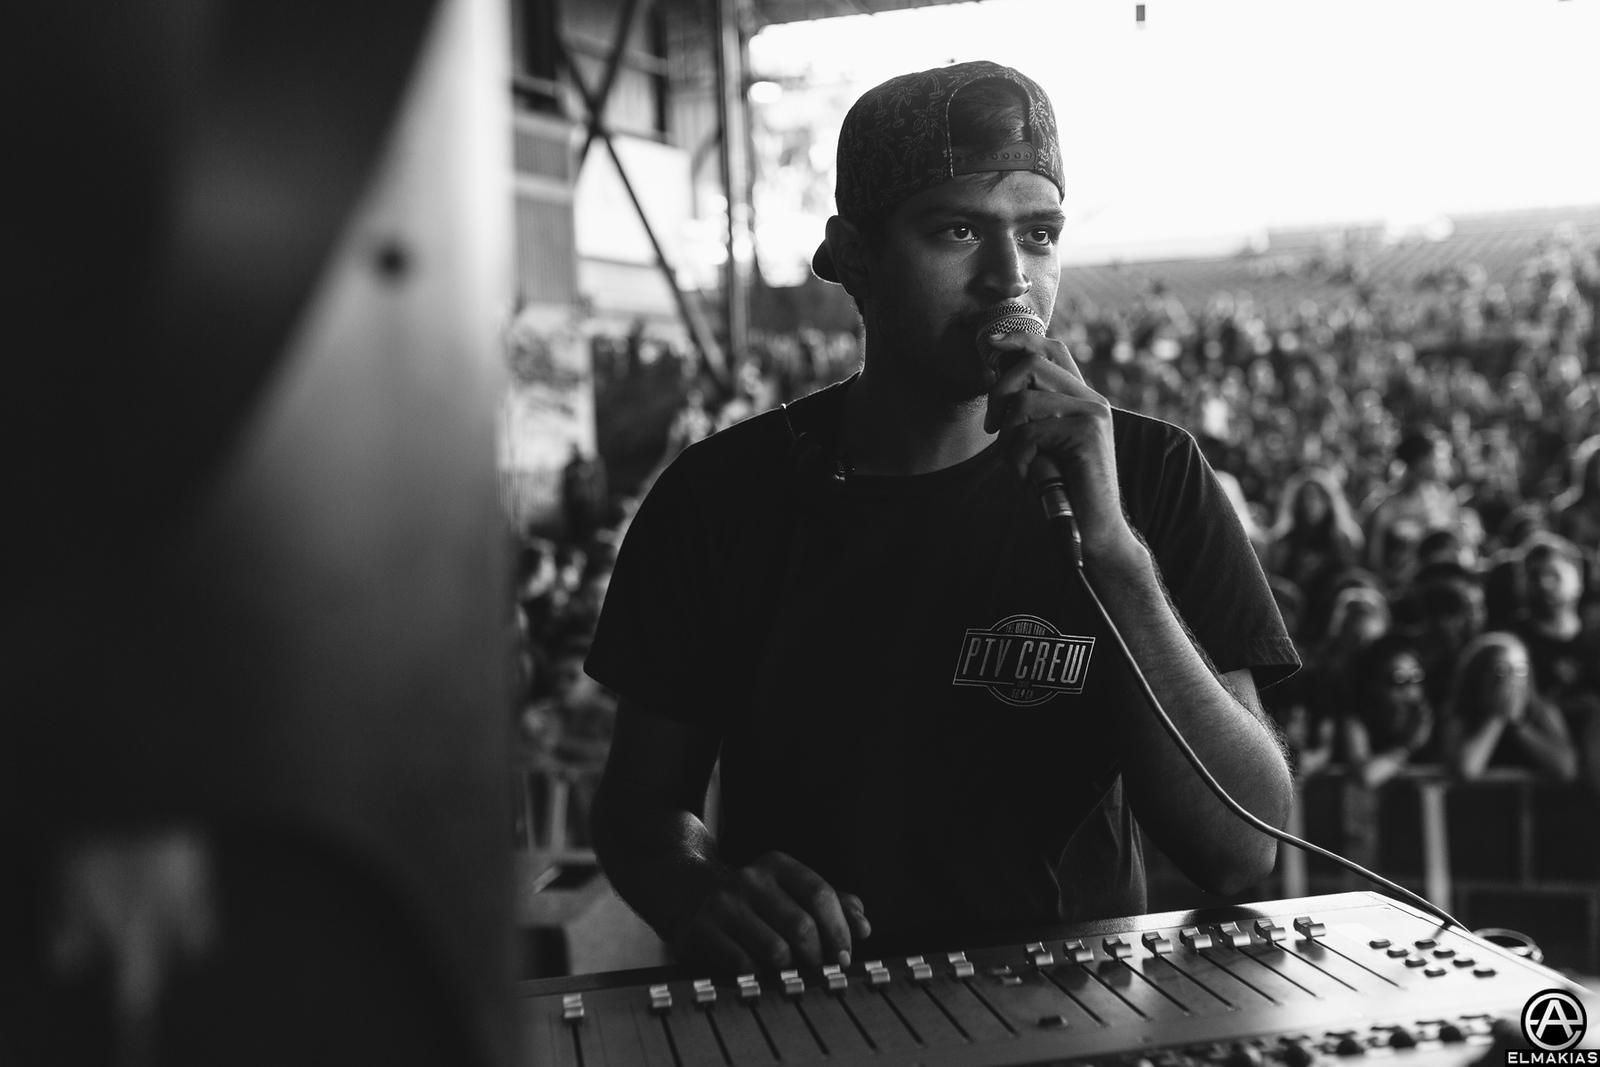 Matt, Pierce the Veil tour manager at Warped Tour 2015 by Adam Elmakias